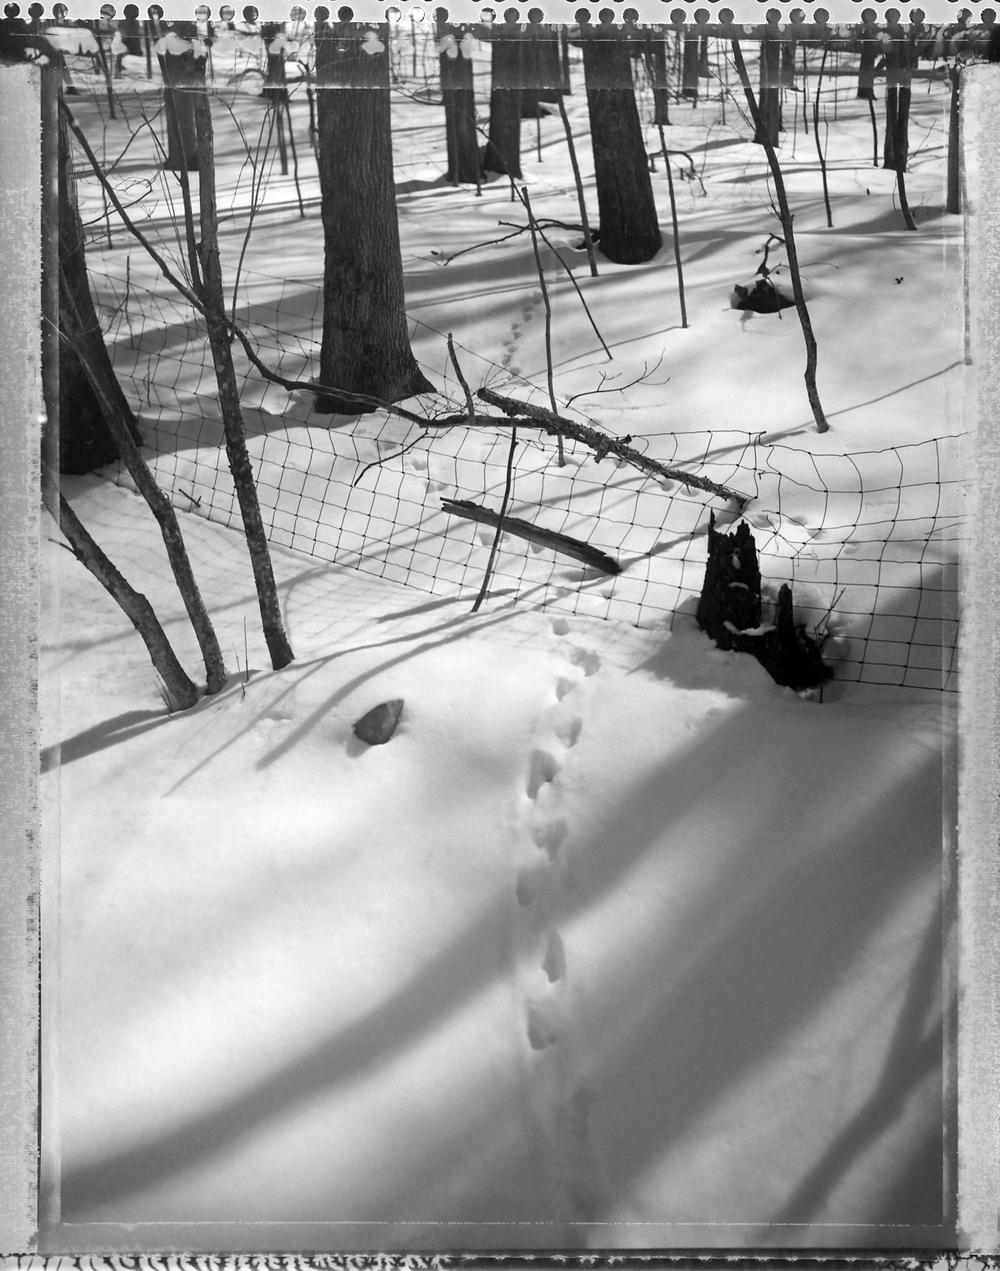 20050319_cru_snowtracks_001.jpg